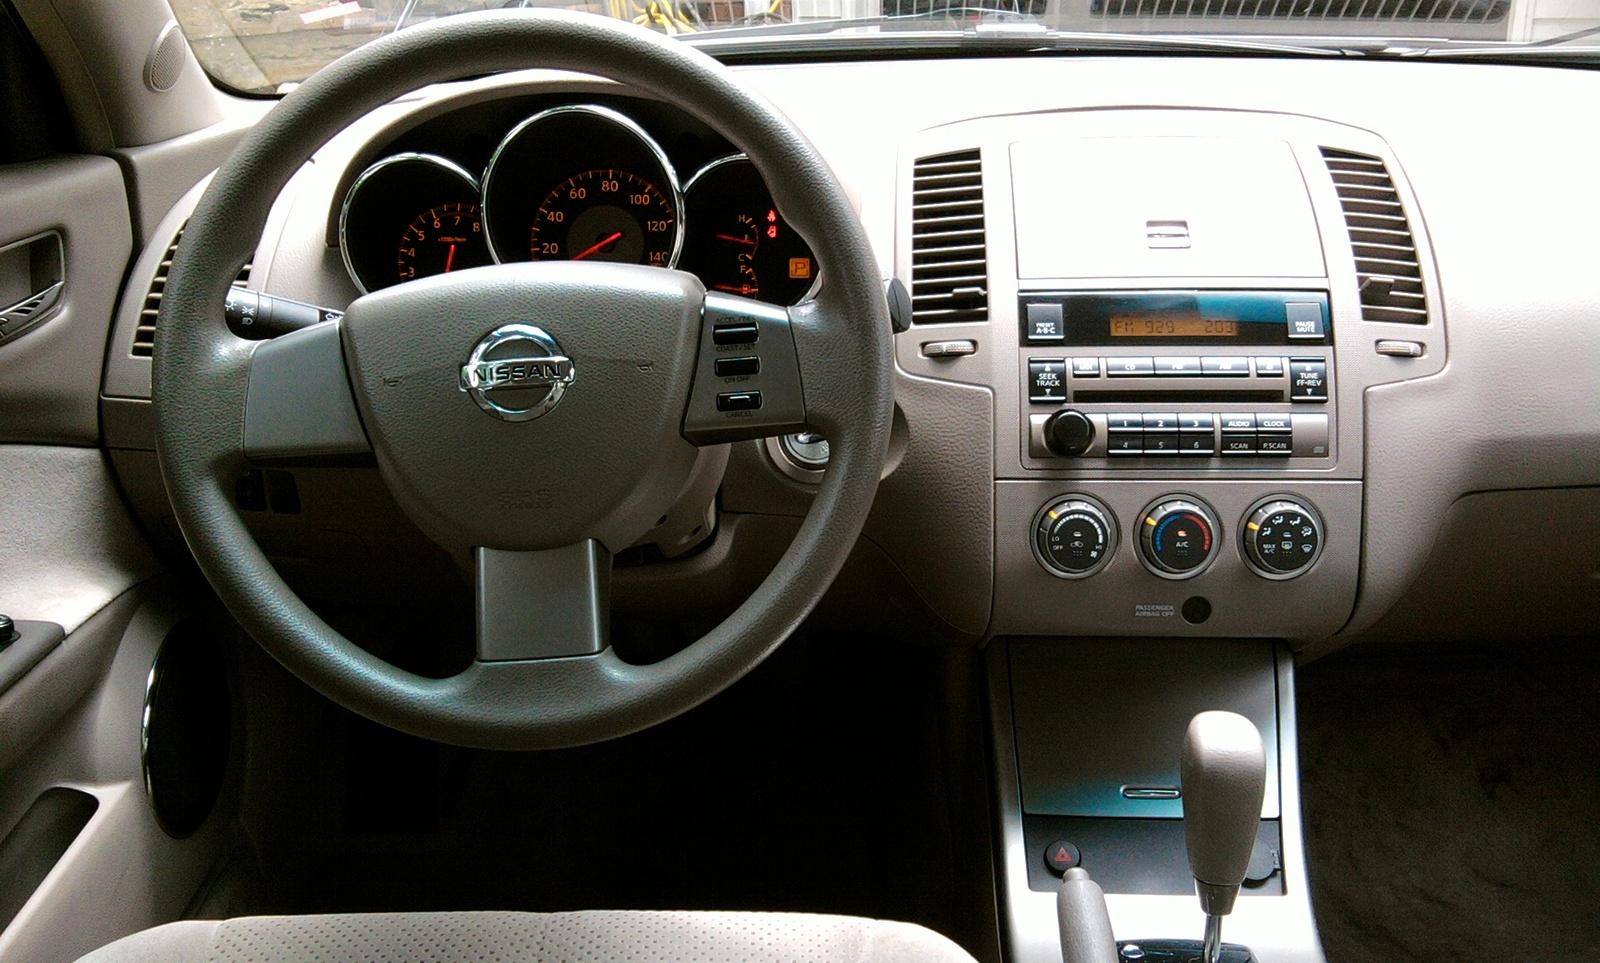 2006 Nissan Altima Image 17